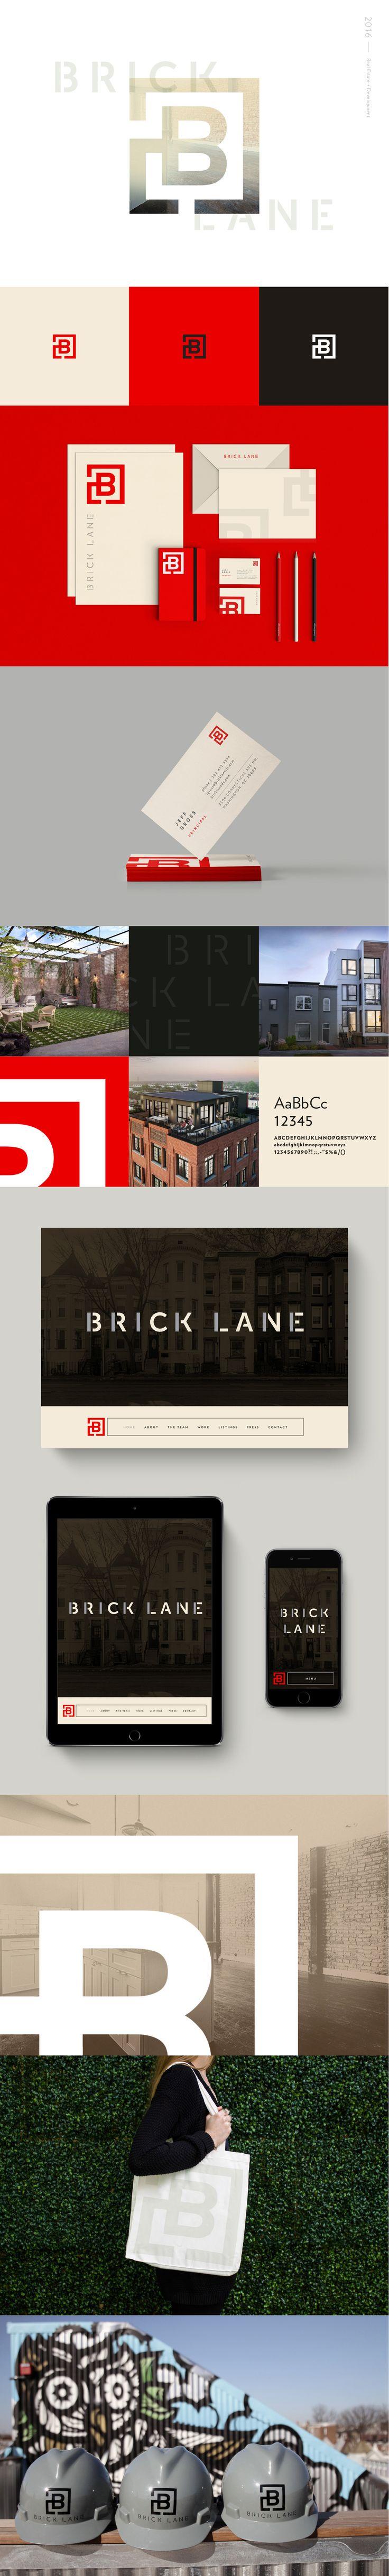 Brick Lane branding design by Rebecca Finn. Brick Lane is a real estate services company based in Washington, D.C.